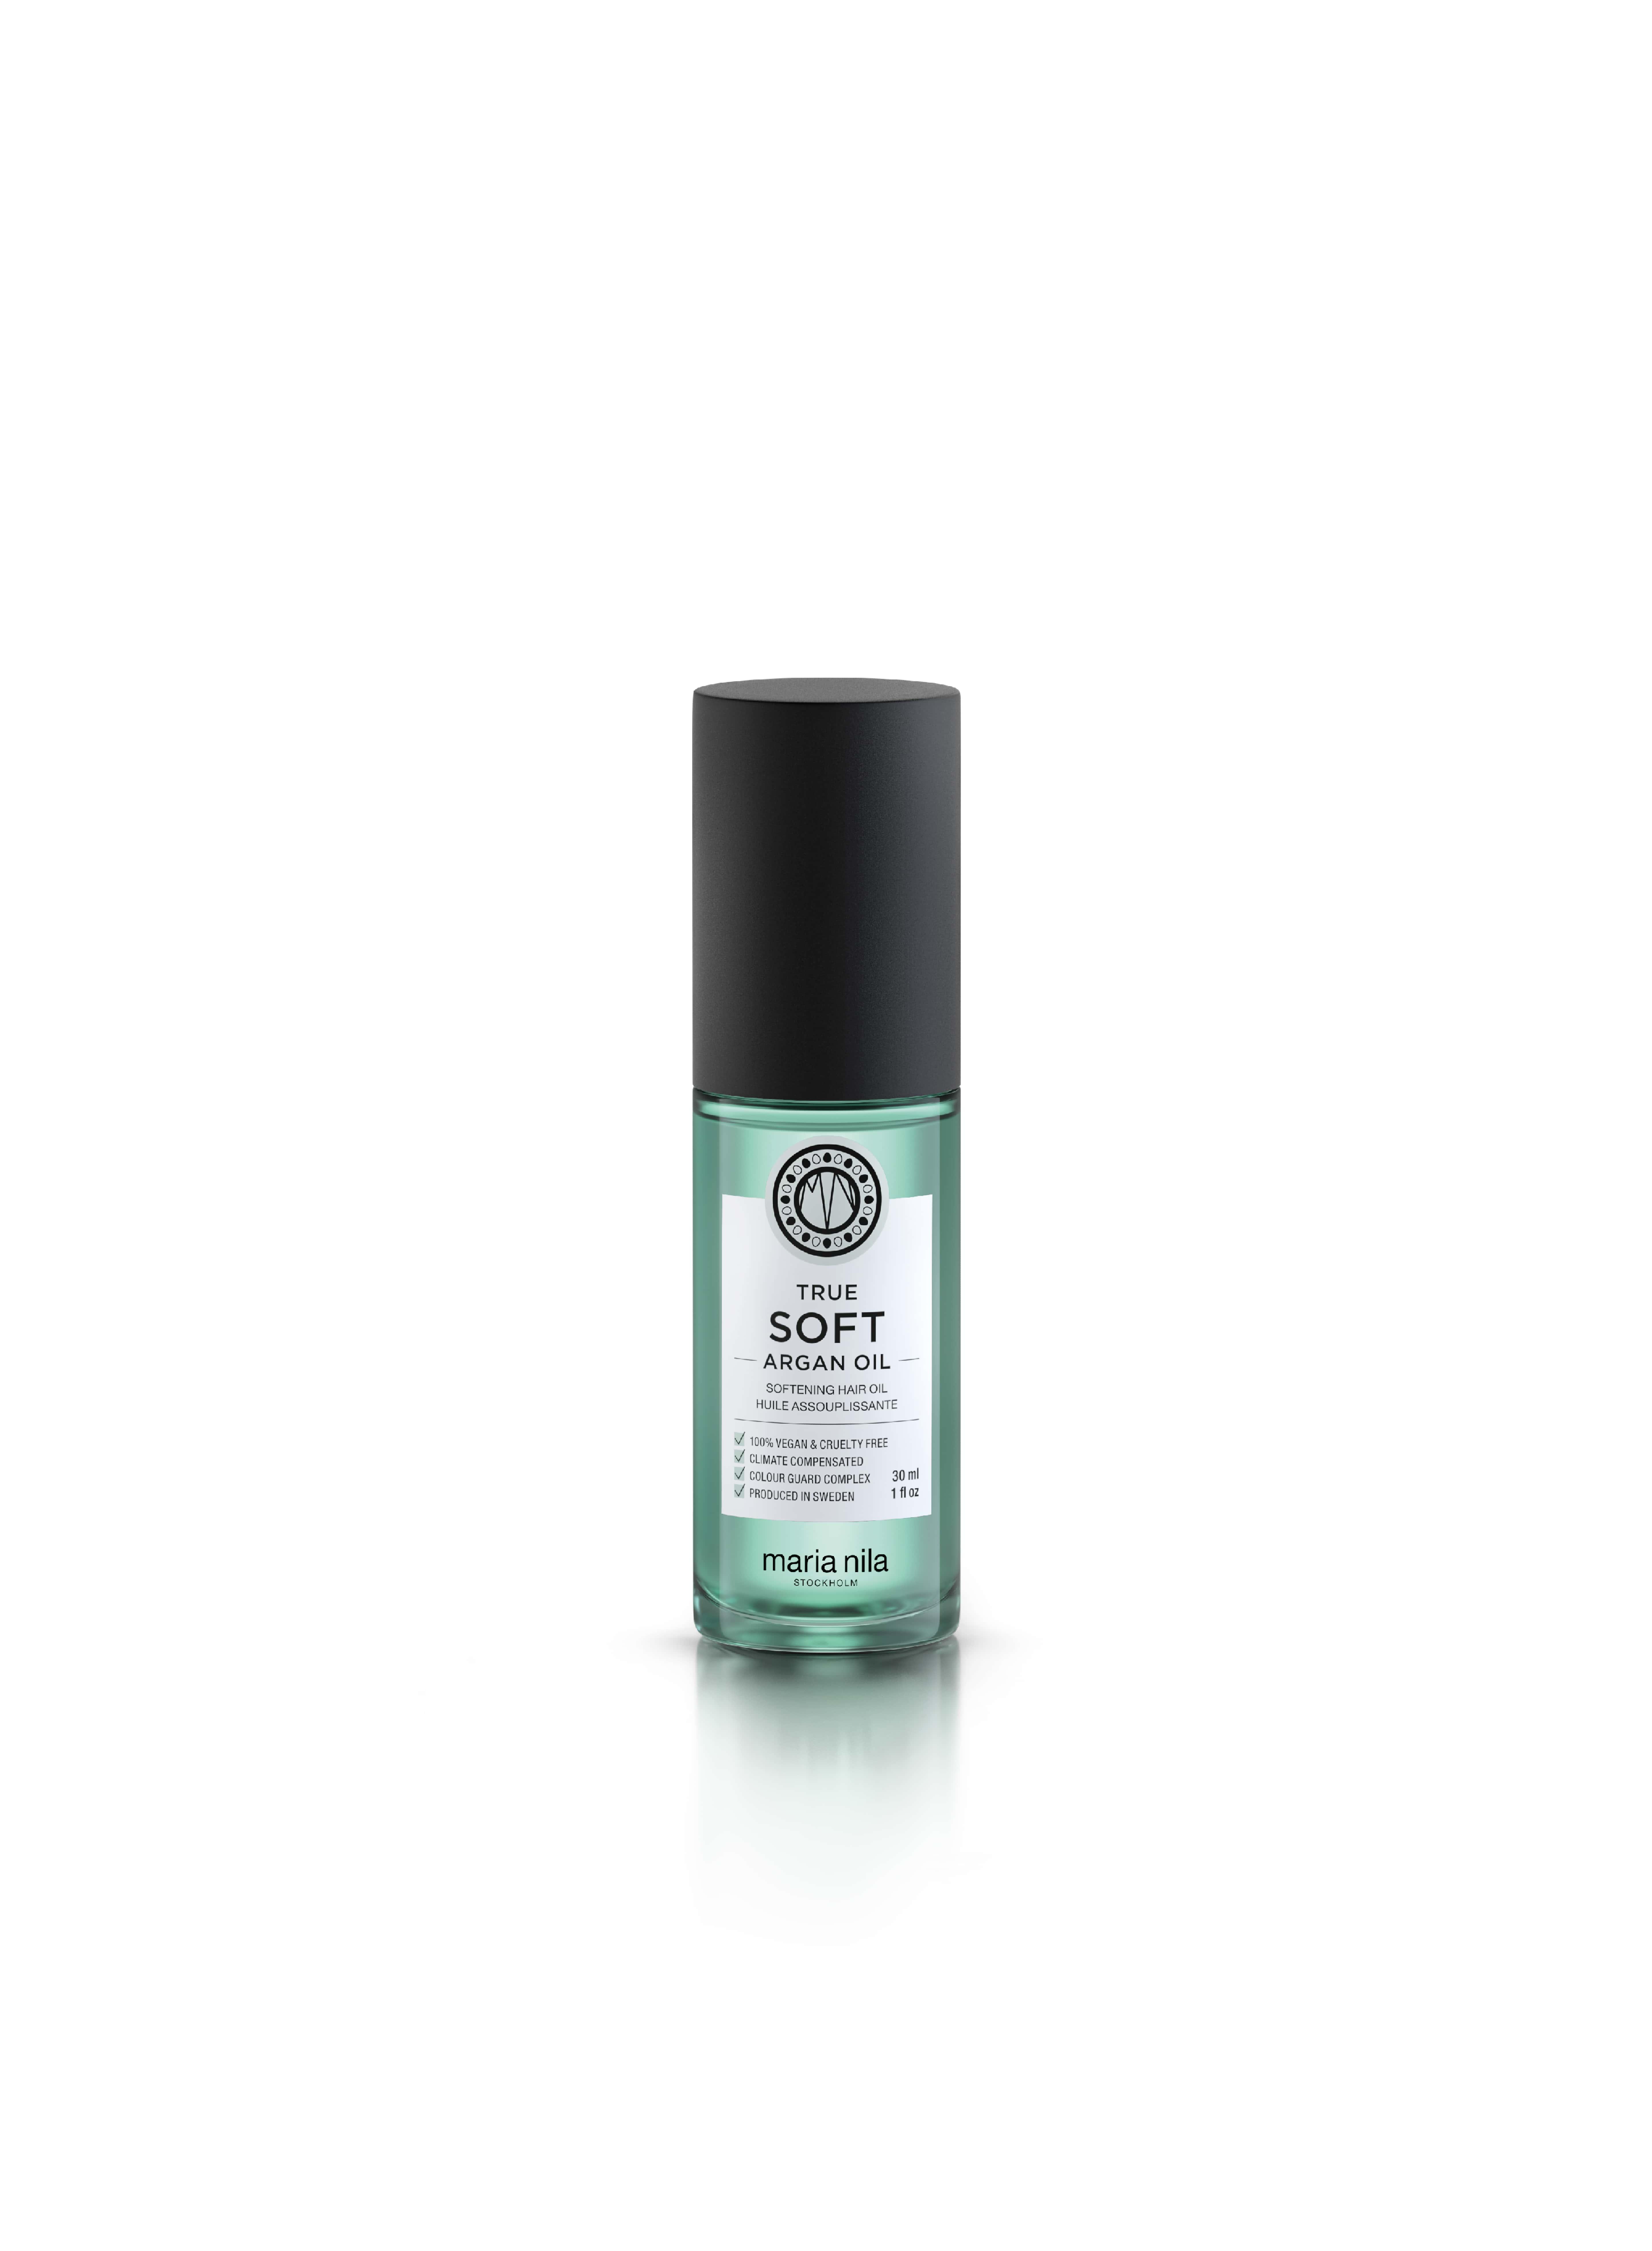 Maria Nila True Soft Argan Oil, 30 ml